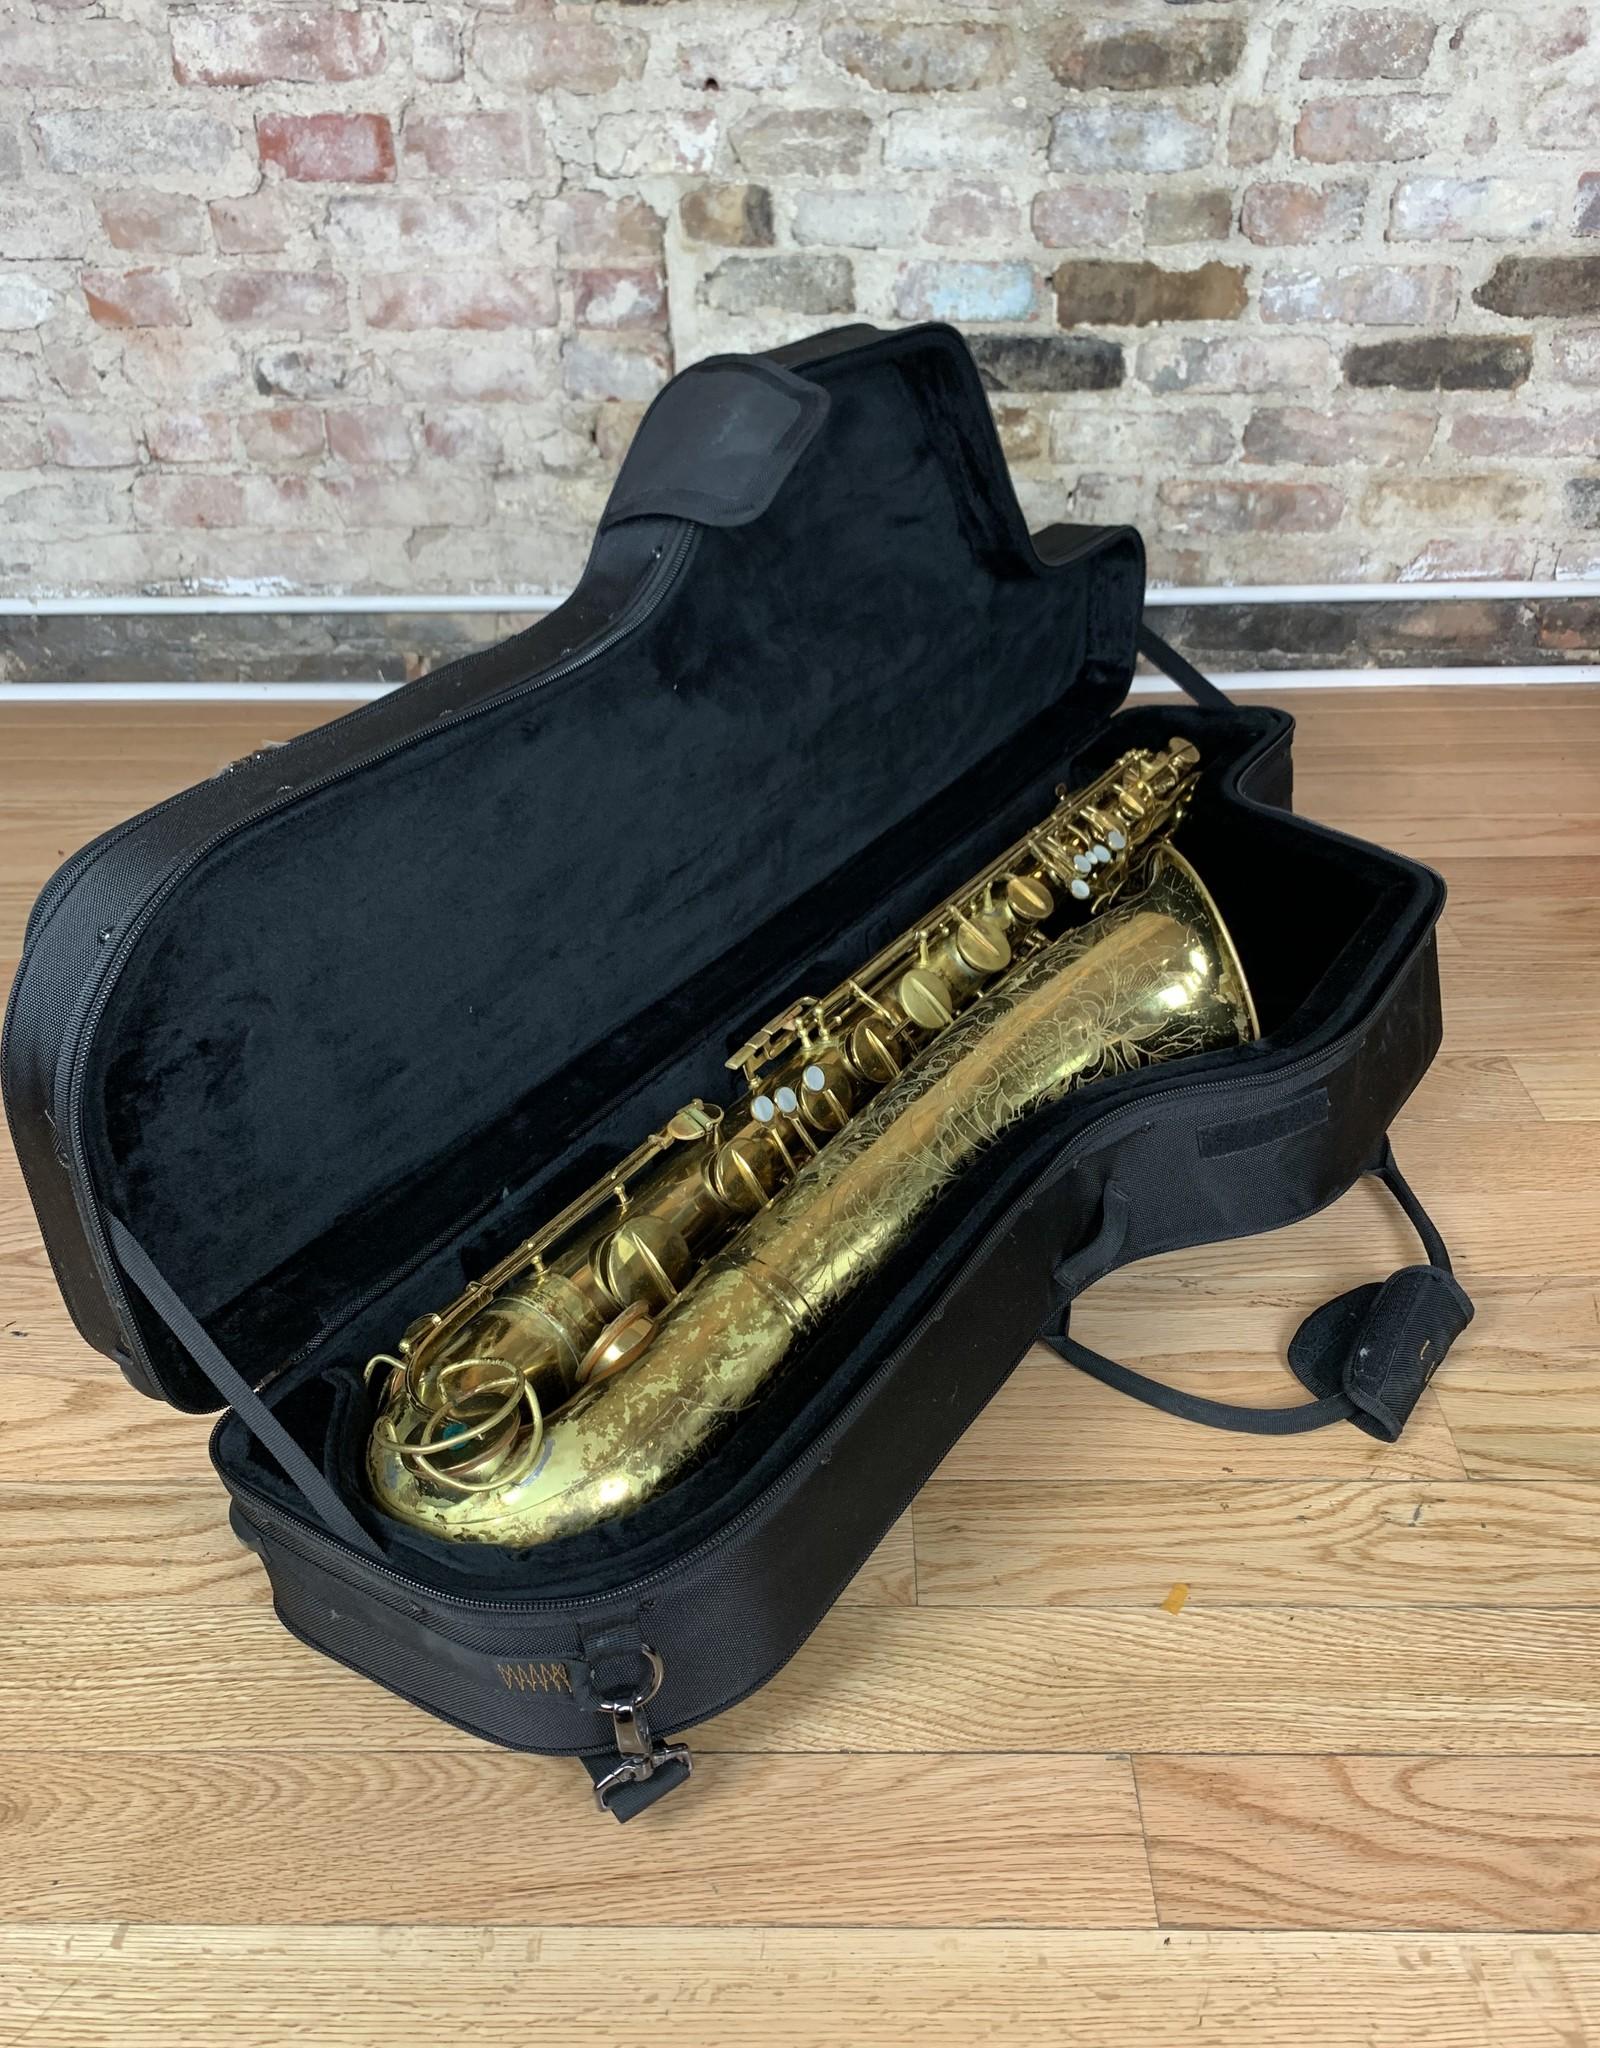 Martin The Martin Committee III Bari Baritone Saxophone Original Lacquer